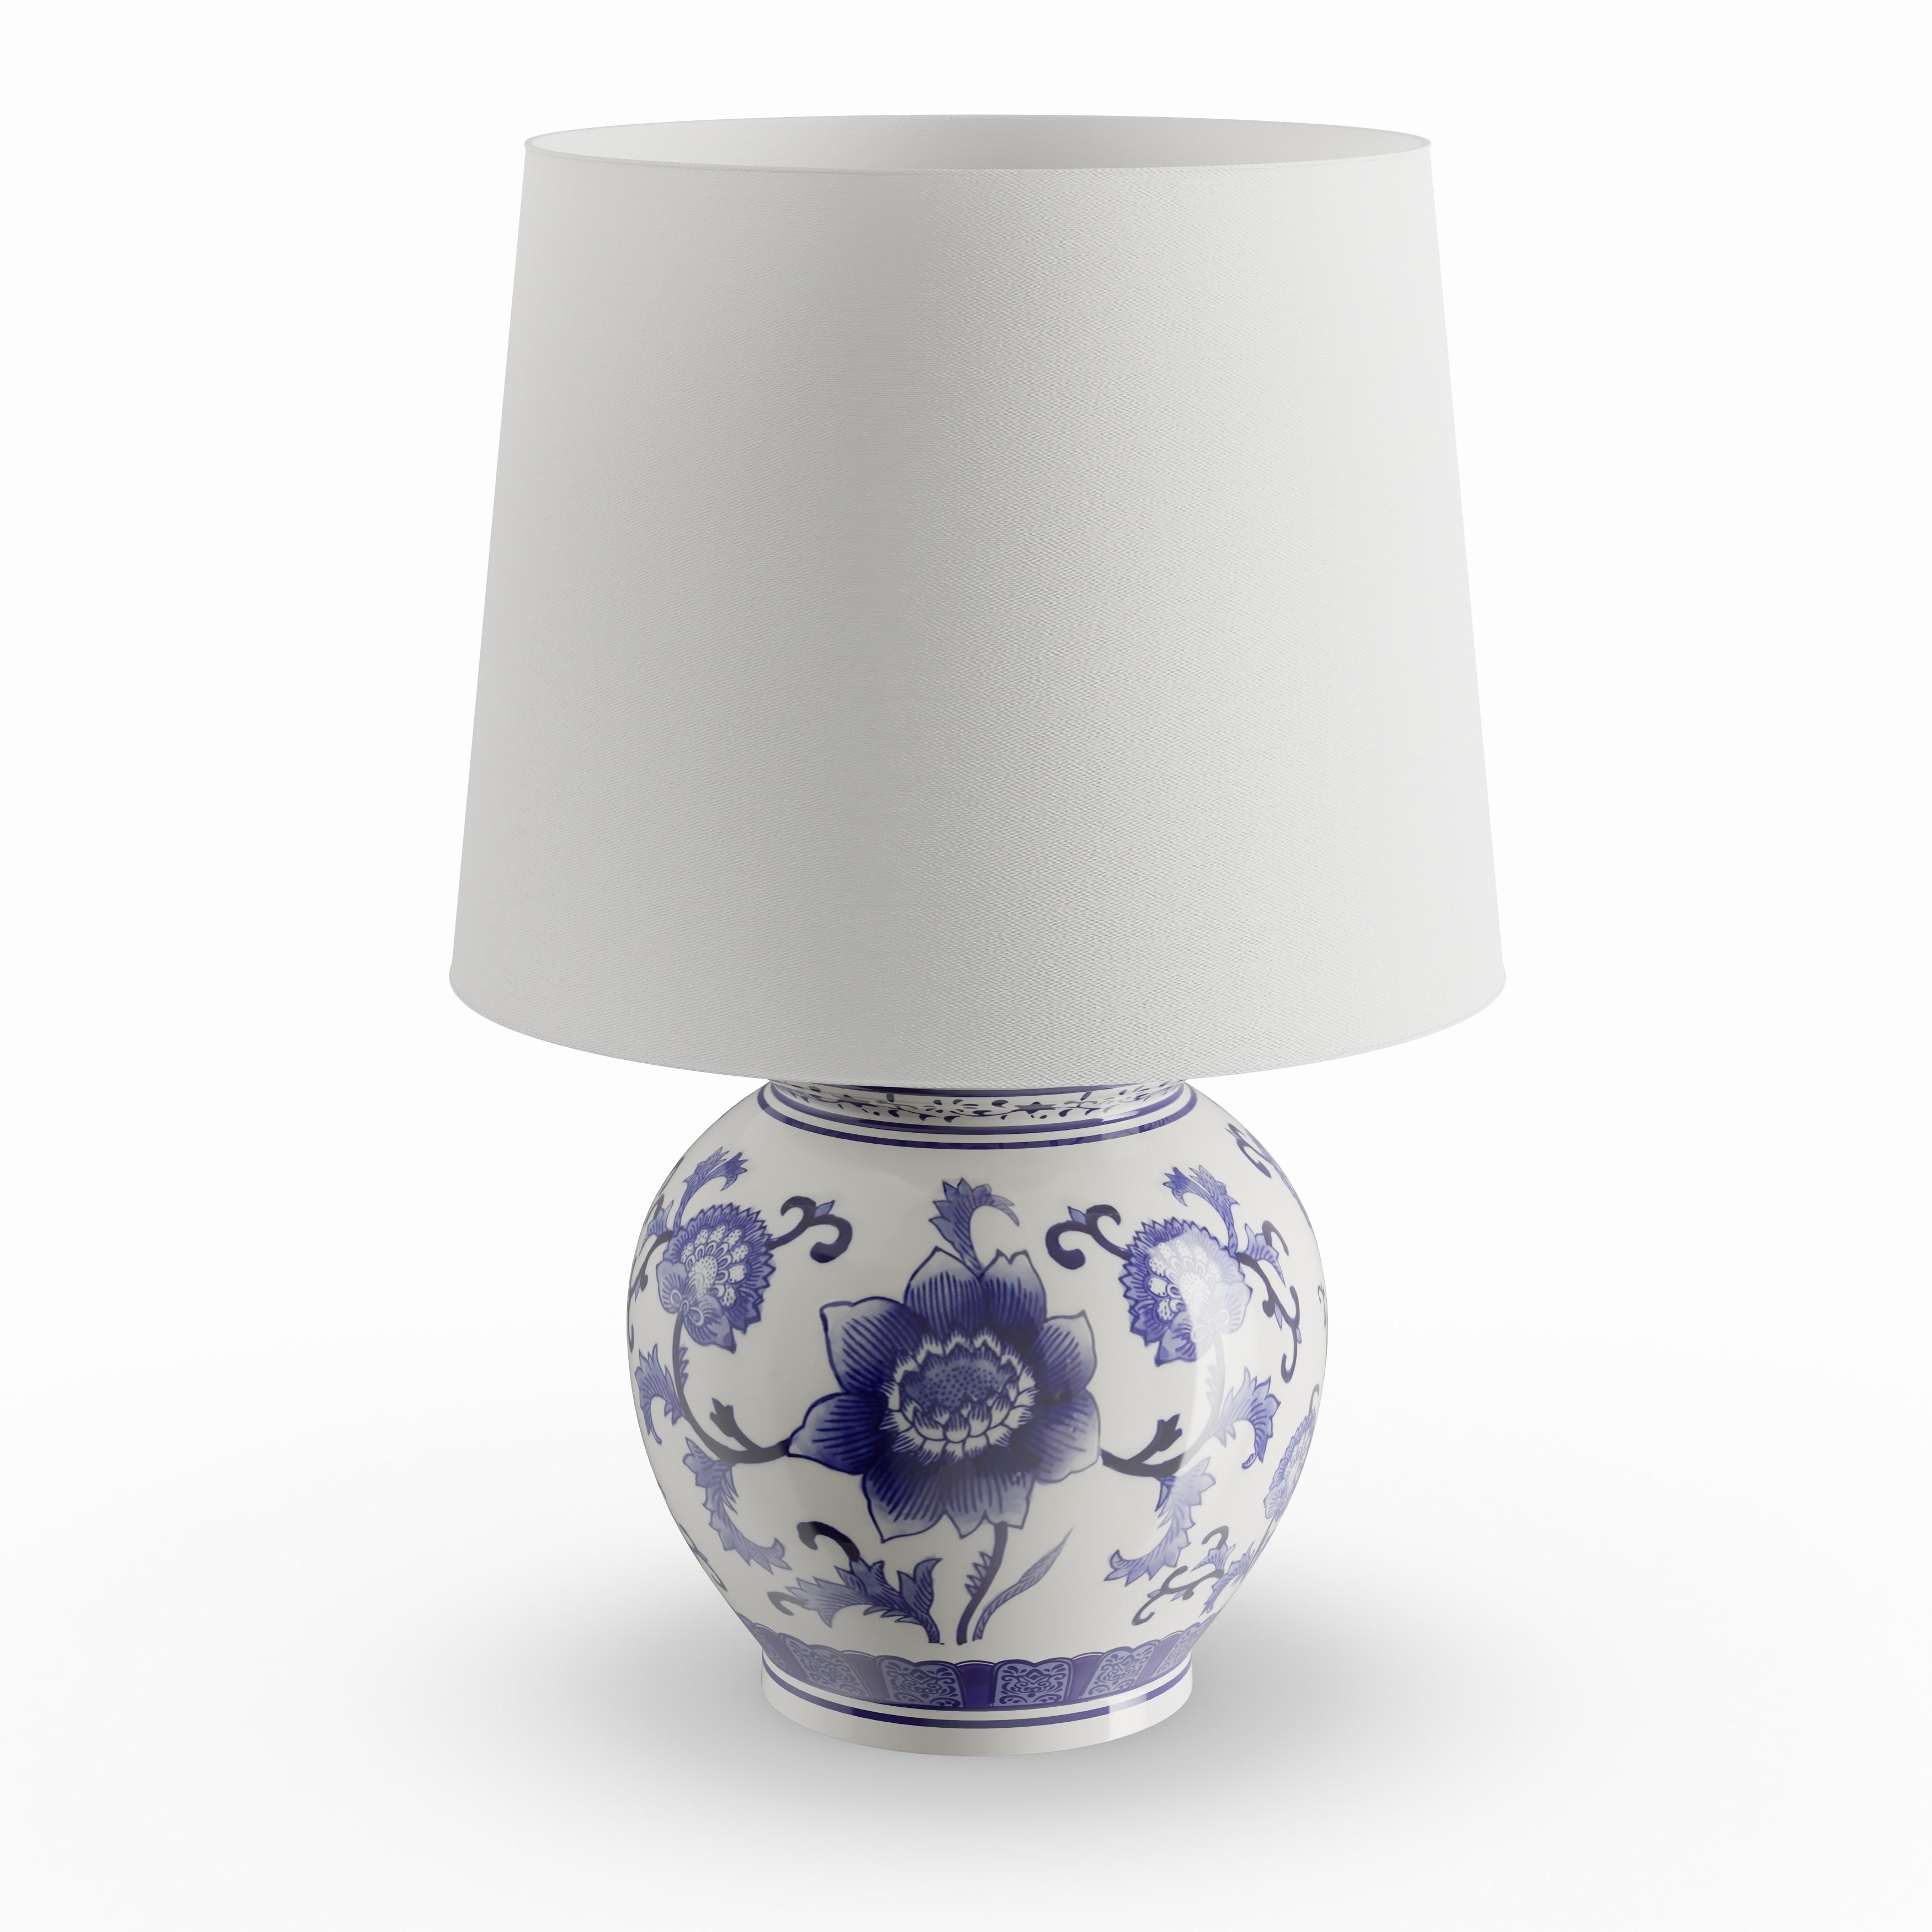 Shop Copper Grove Brightsand Blue White Ceramic Table Lamp Free